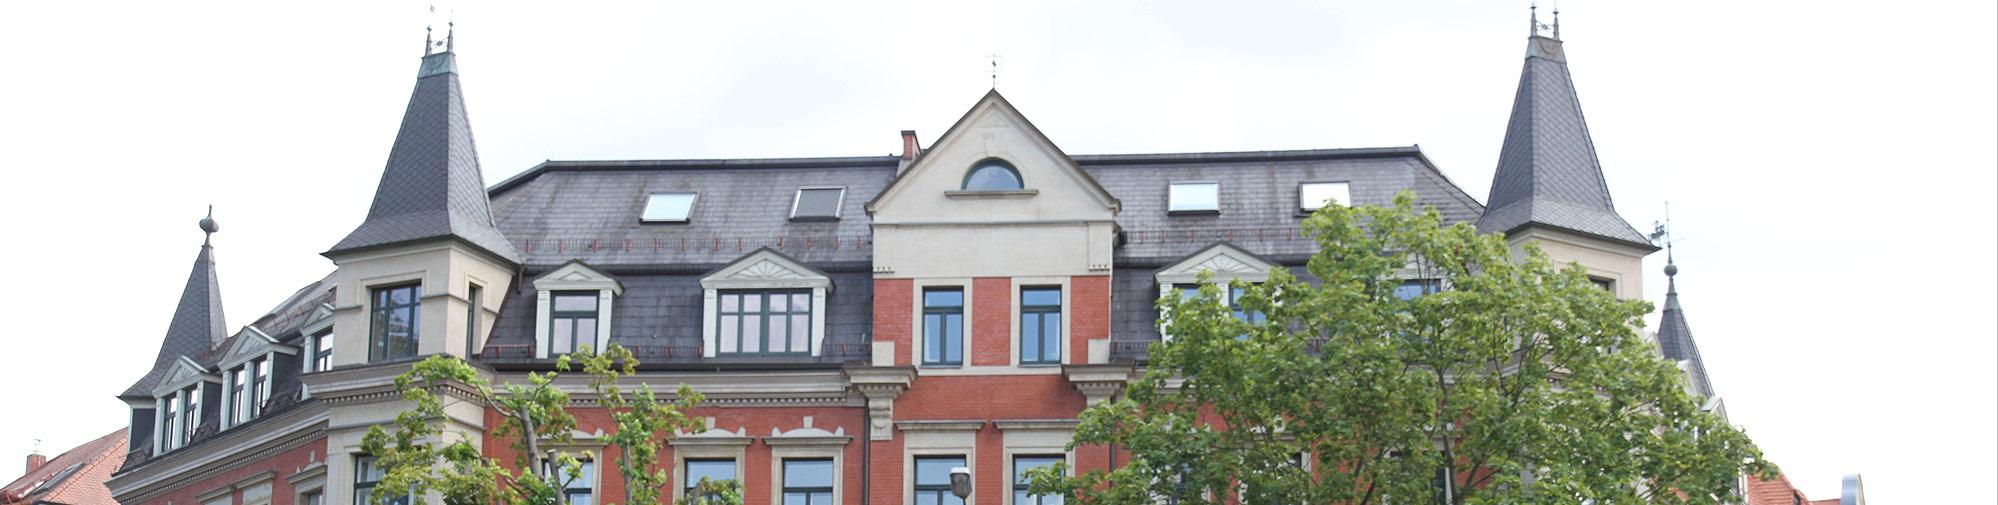 Unger Immobilien Leipzig